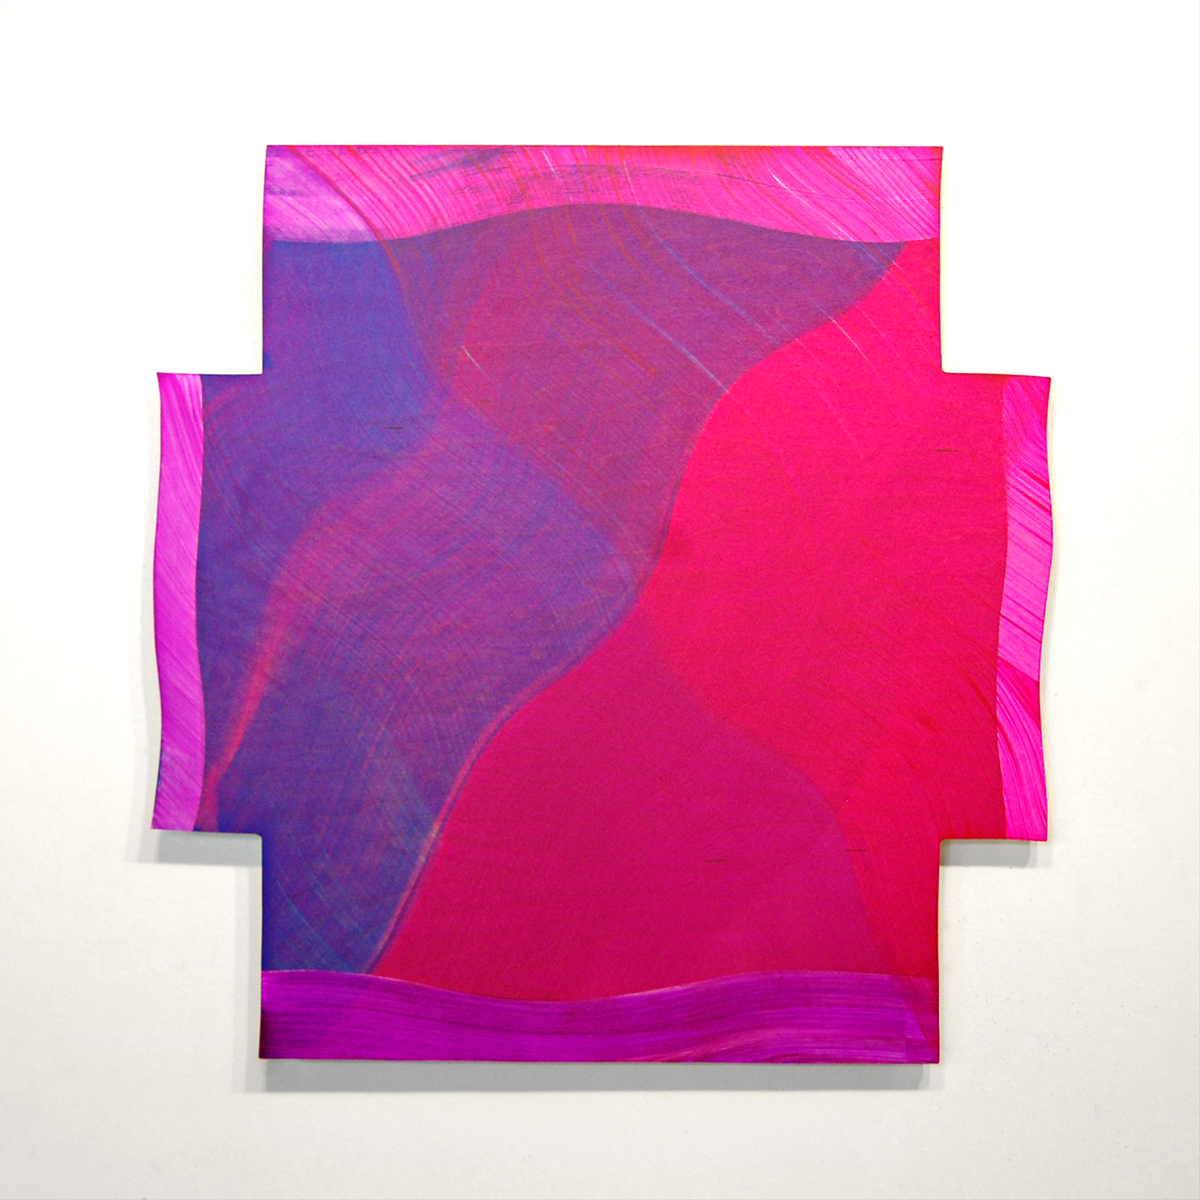 Blush Blaze, 2016, Acrylic on panel, 24x24 inches